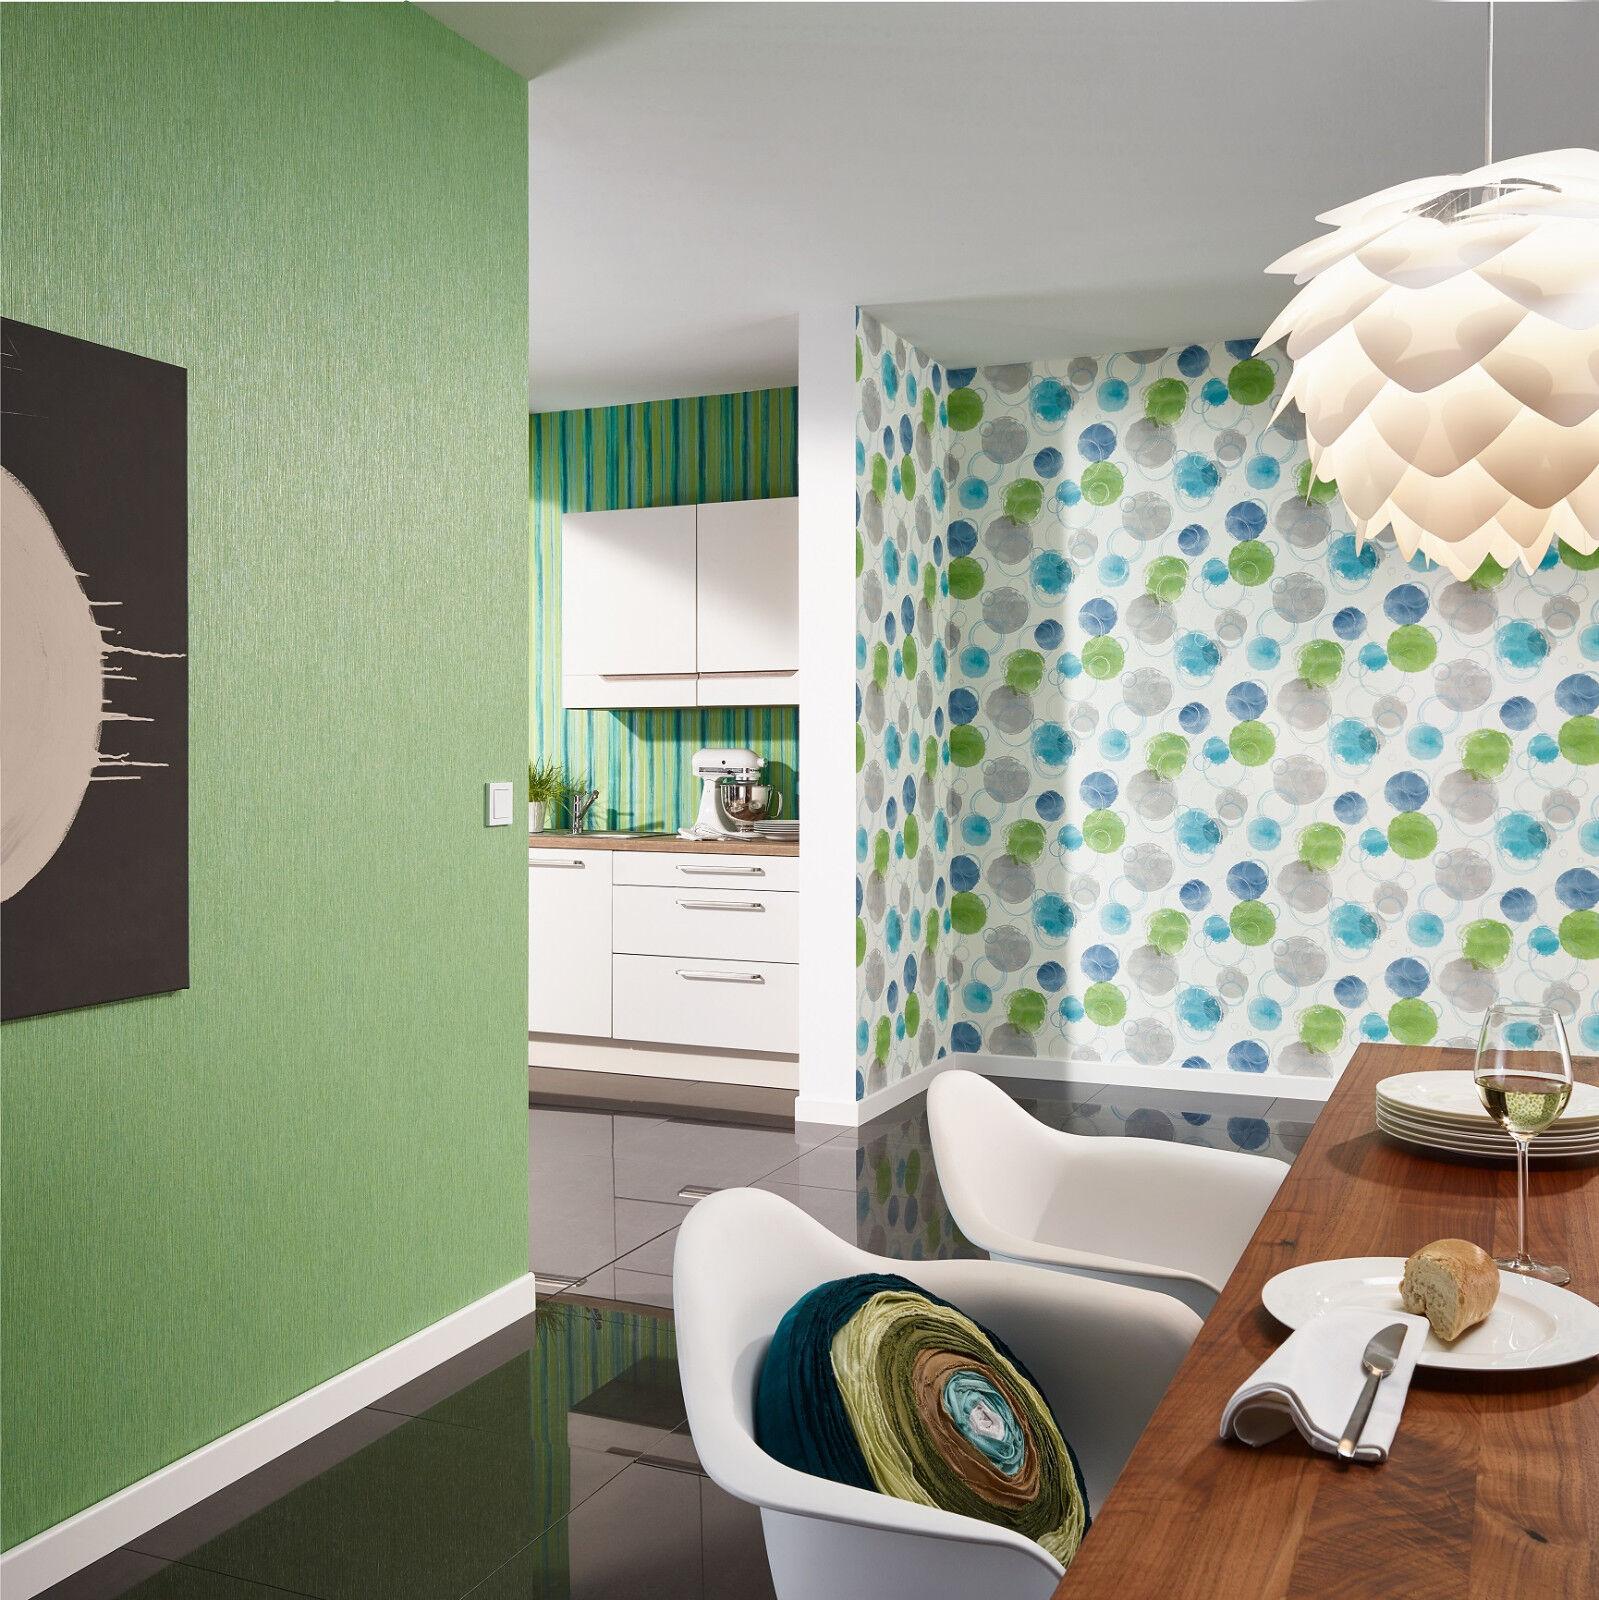 vlies tapete retro muster floral kreise punkte wei grau pink gr n blau t rkis kaufen bei. Black Bedroom Furniture Sets. Home Design Ideas